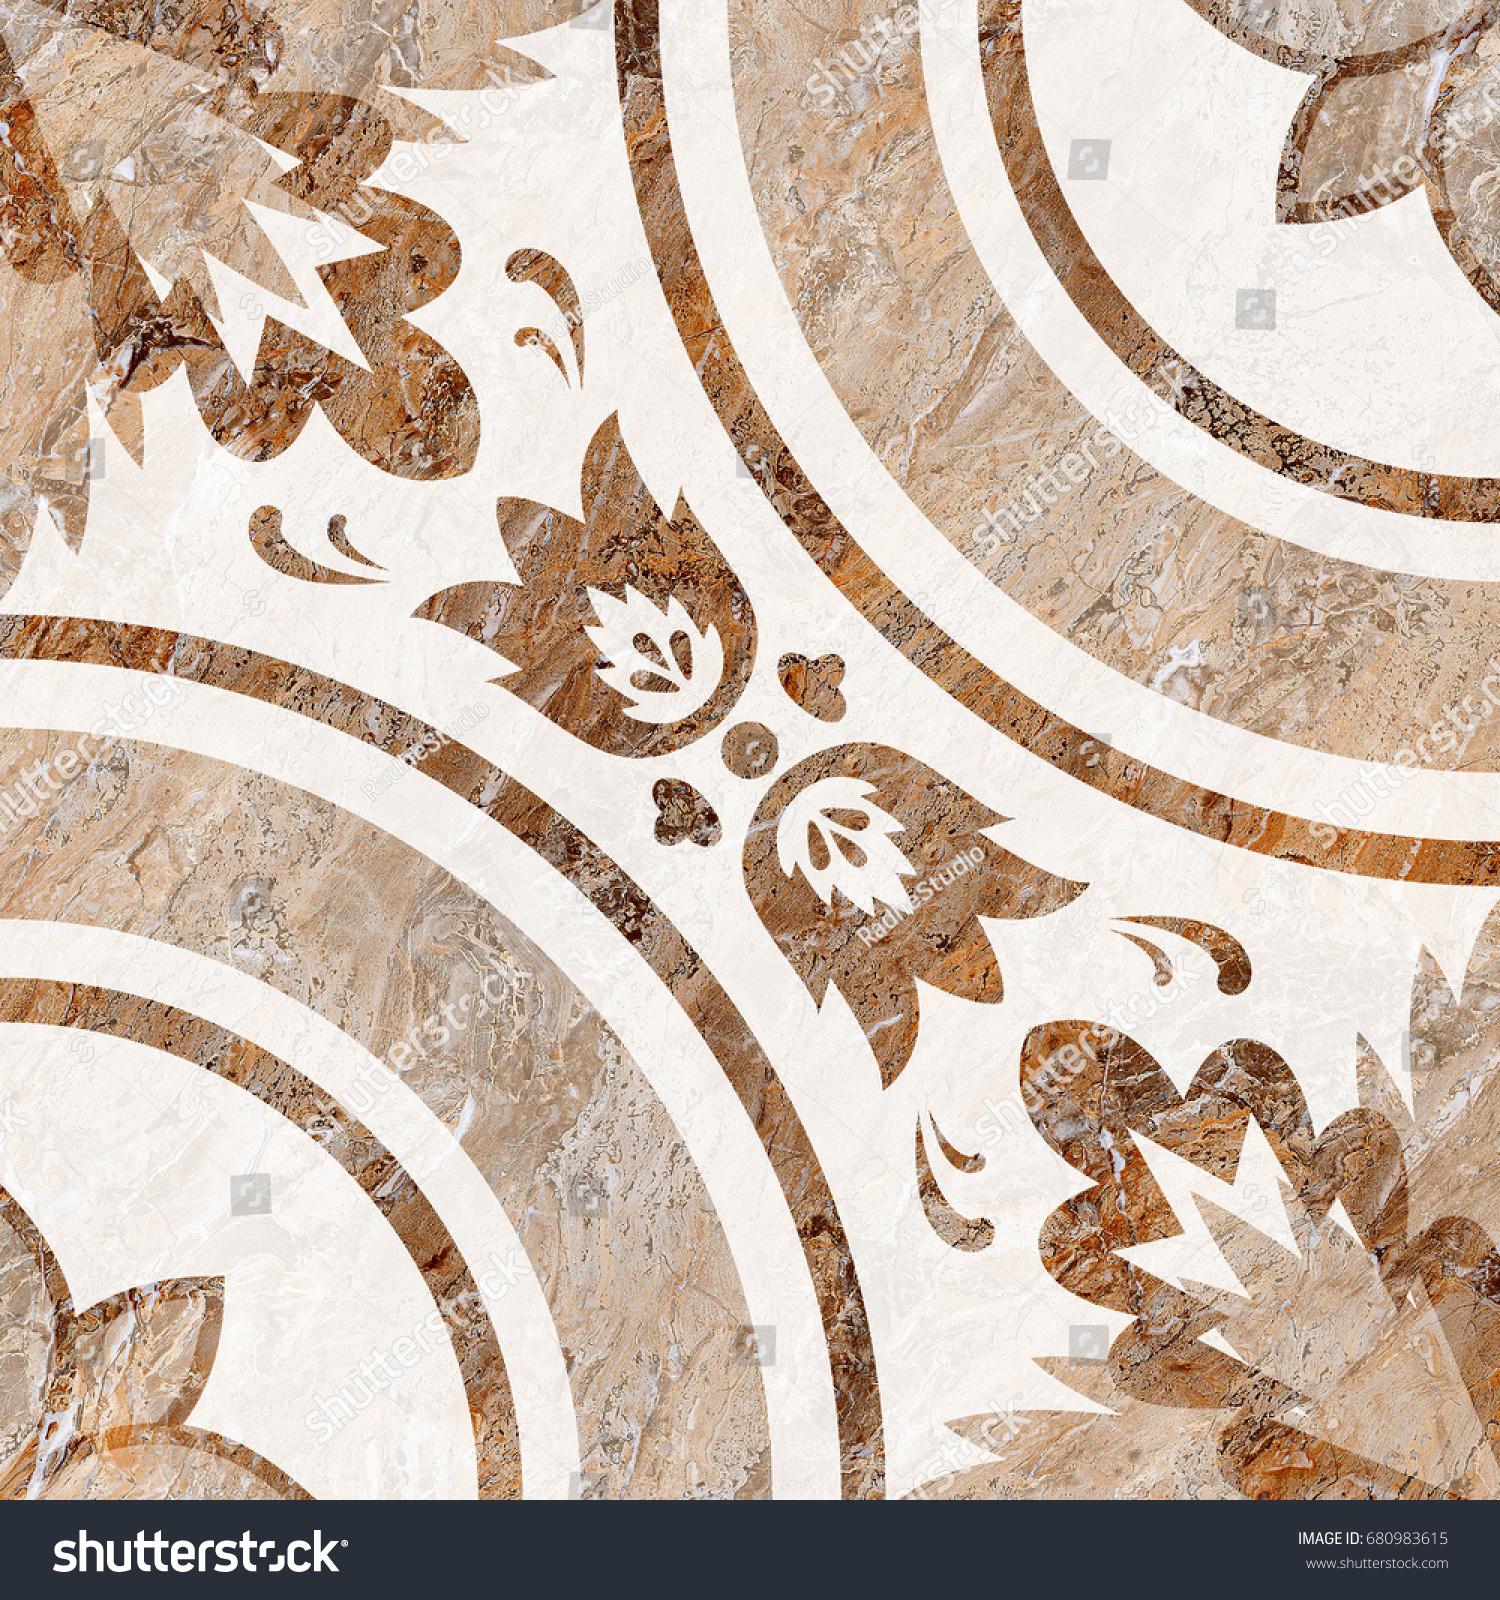 Marble floor tiles pattern stock illustration 680983615 shutterstock marble floor tiles pattern dailygadgetfo Choice Image